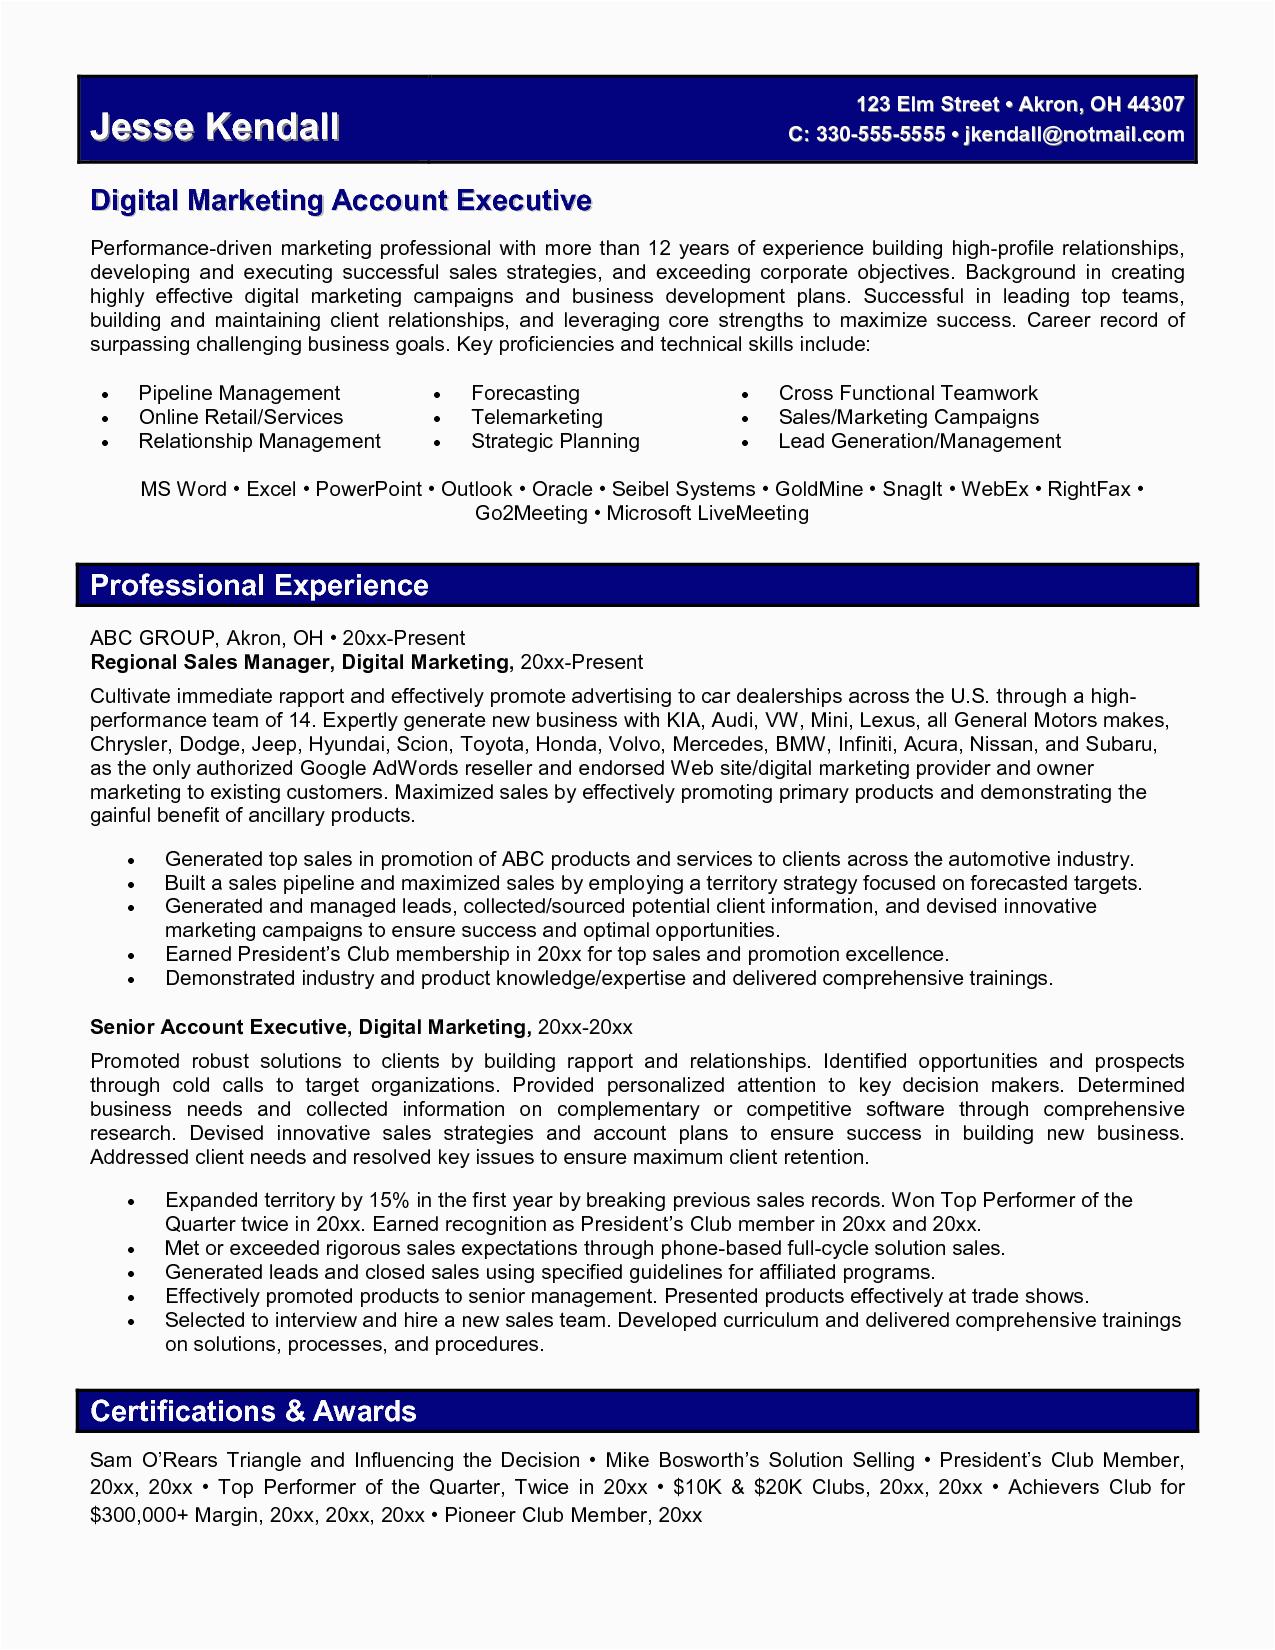 digital marketing resume 7306